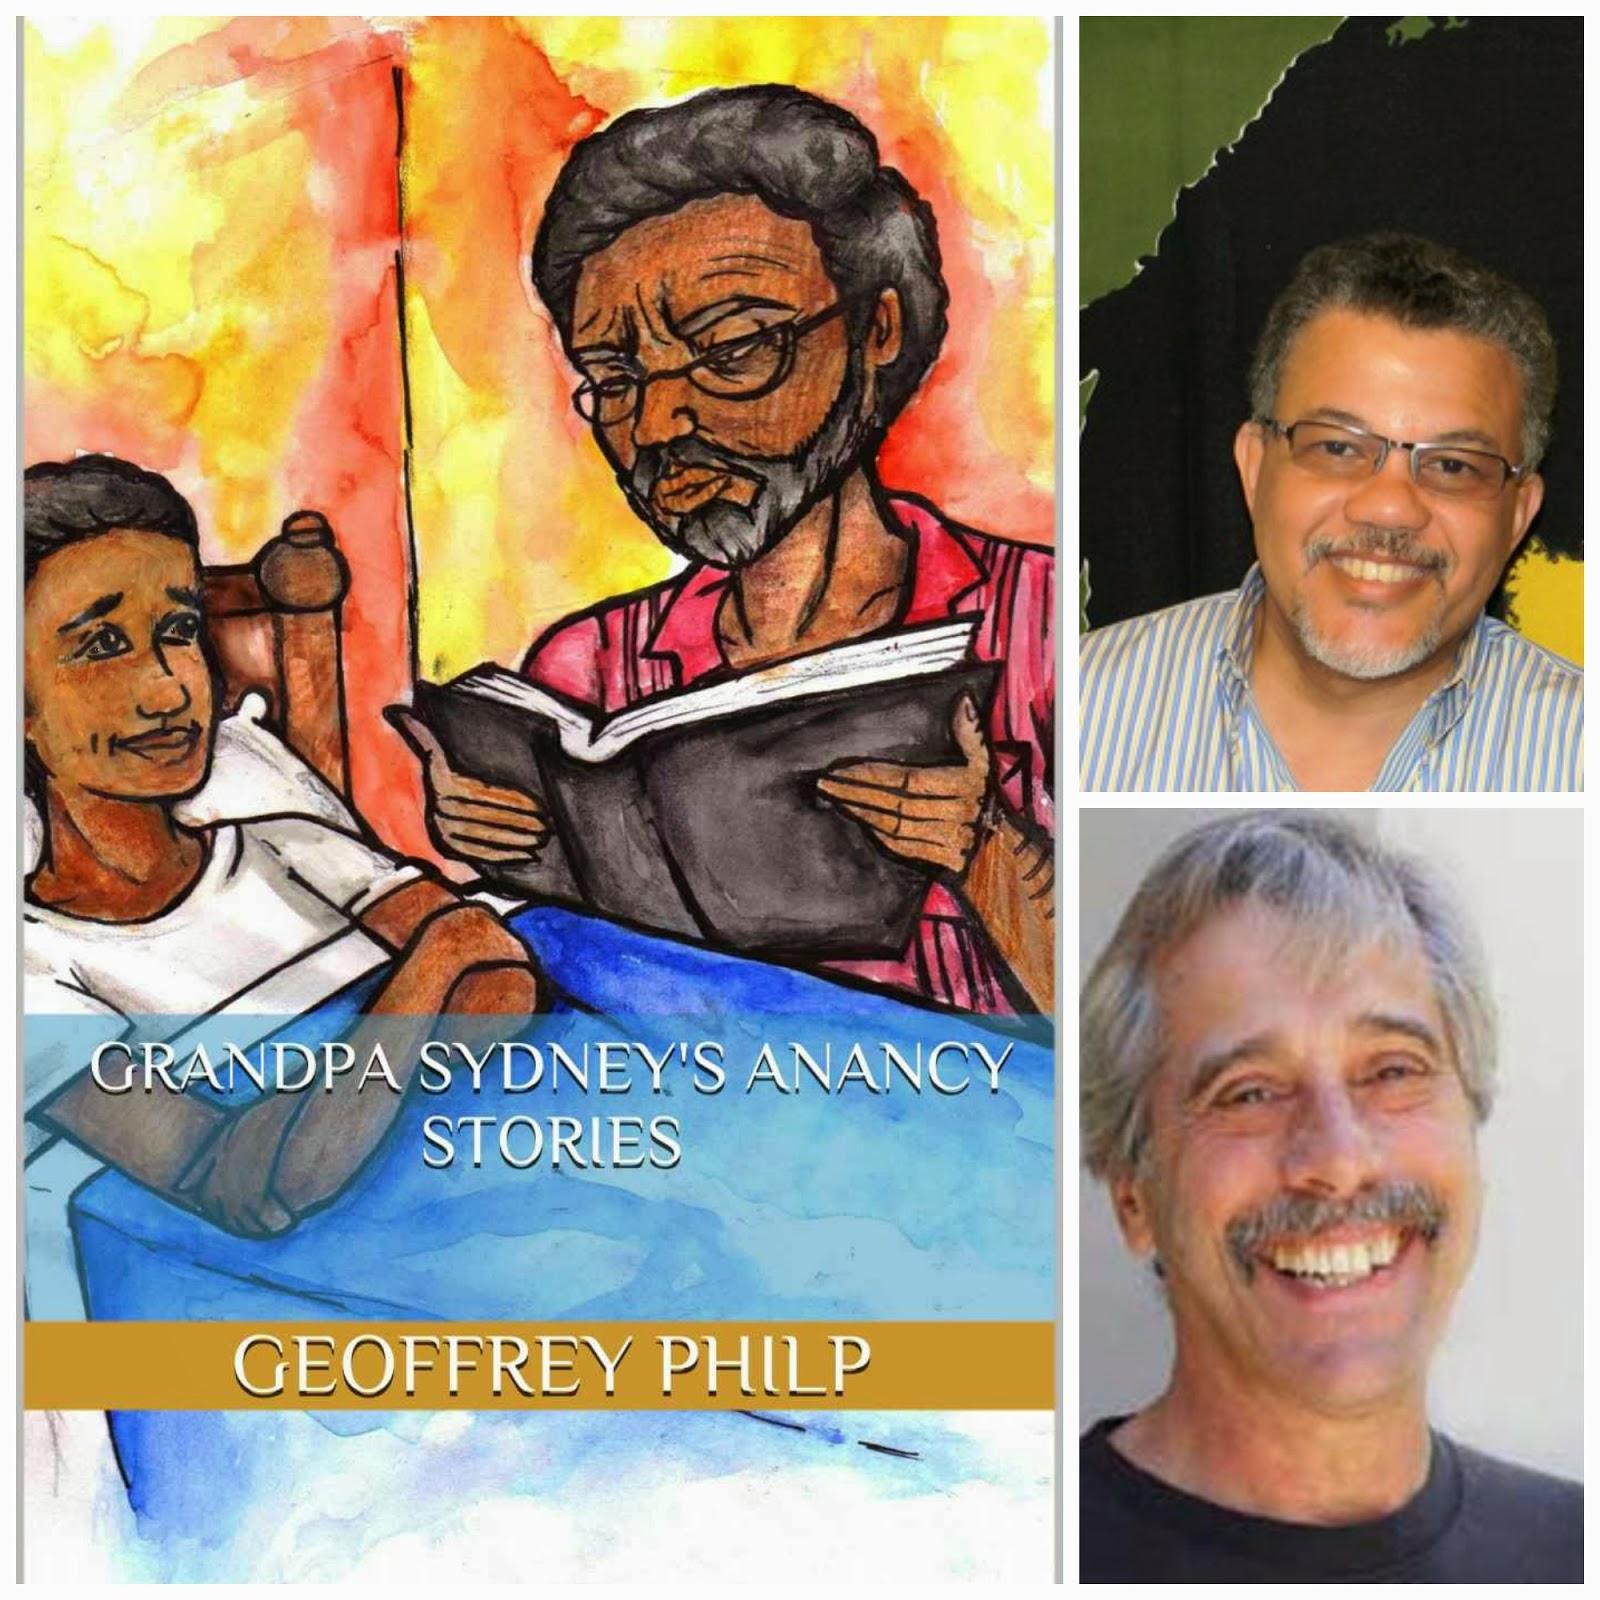 Free Download Of Grandpa Sydneys Anancy Stories